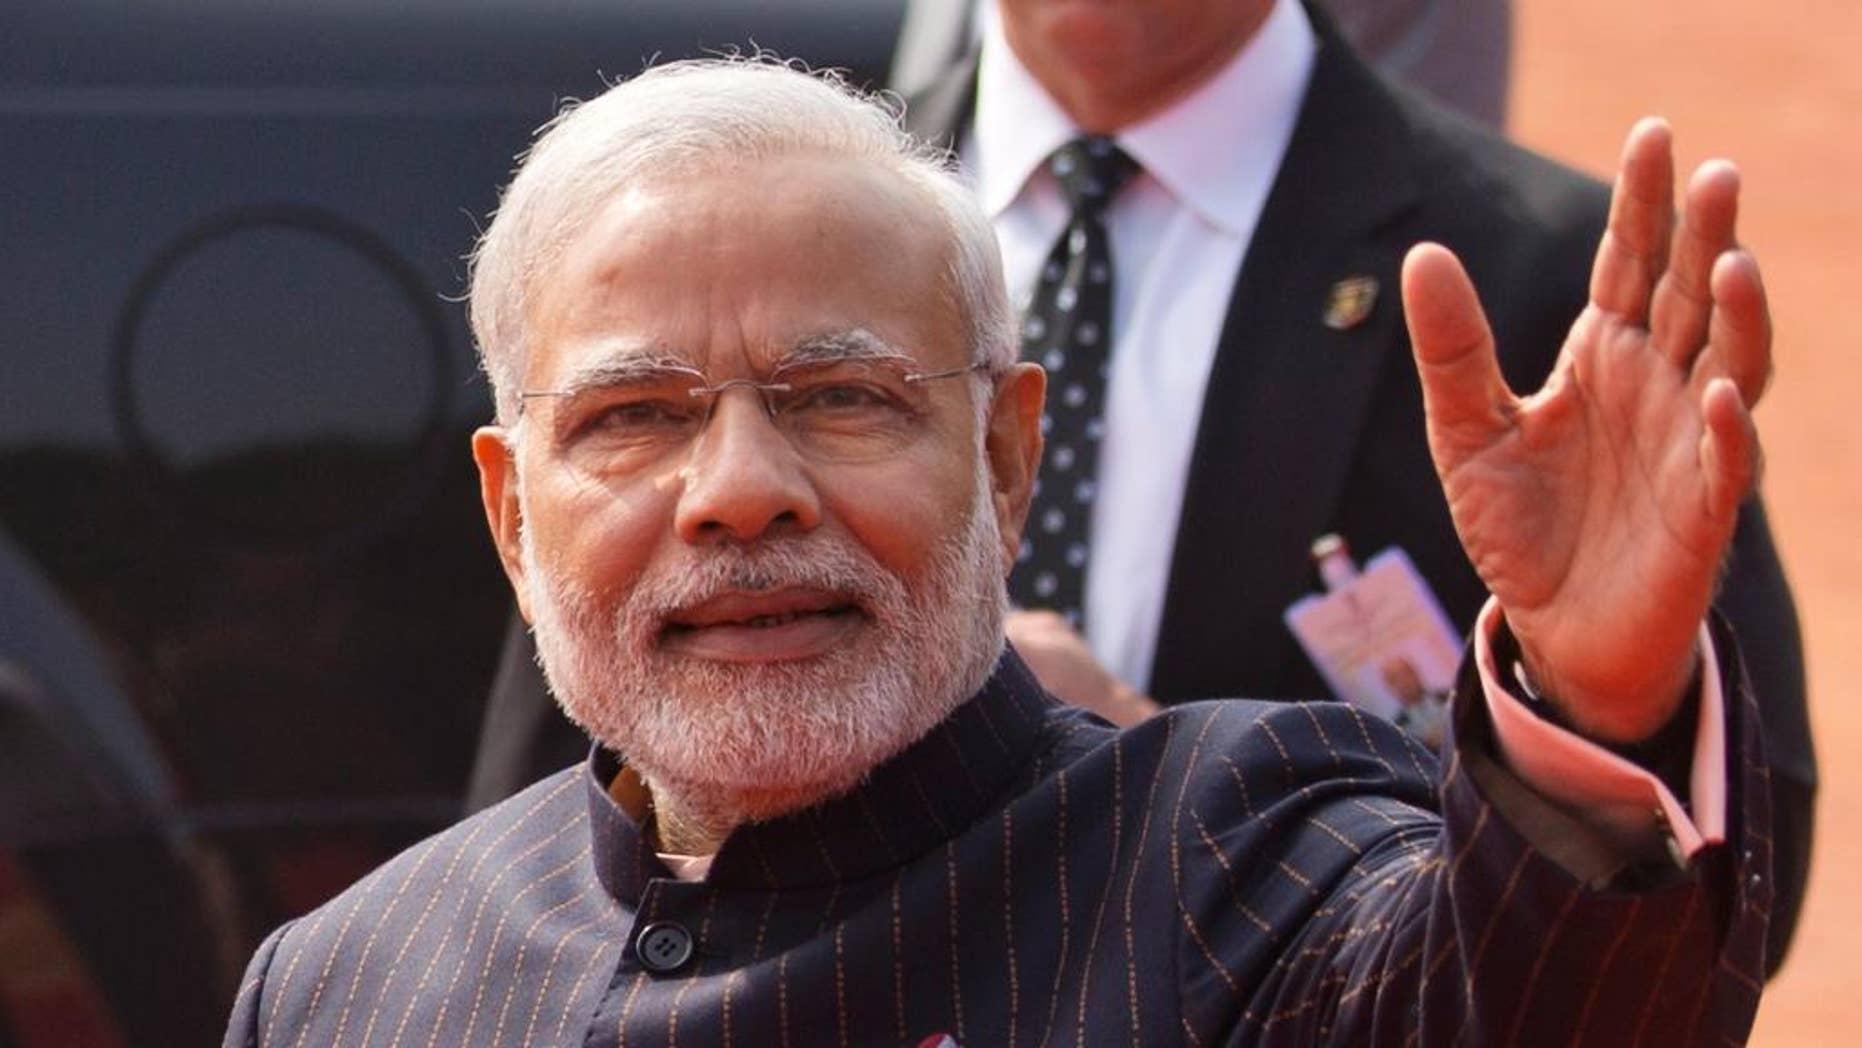 Jan. 25, 2015: Indian Prime Minister Narendra Modi waves during a reception for President Obama in New Delhi.